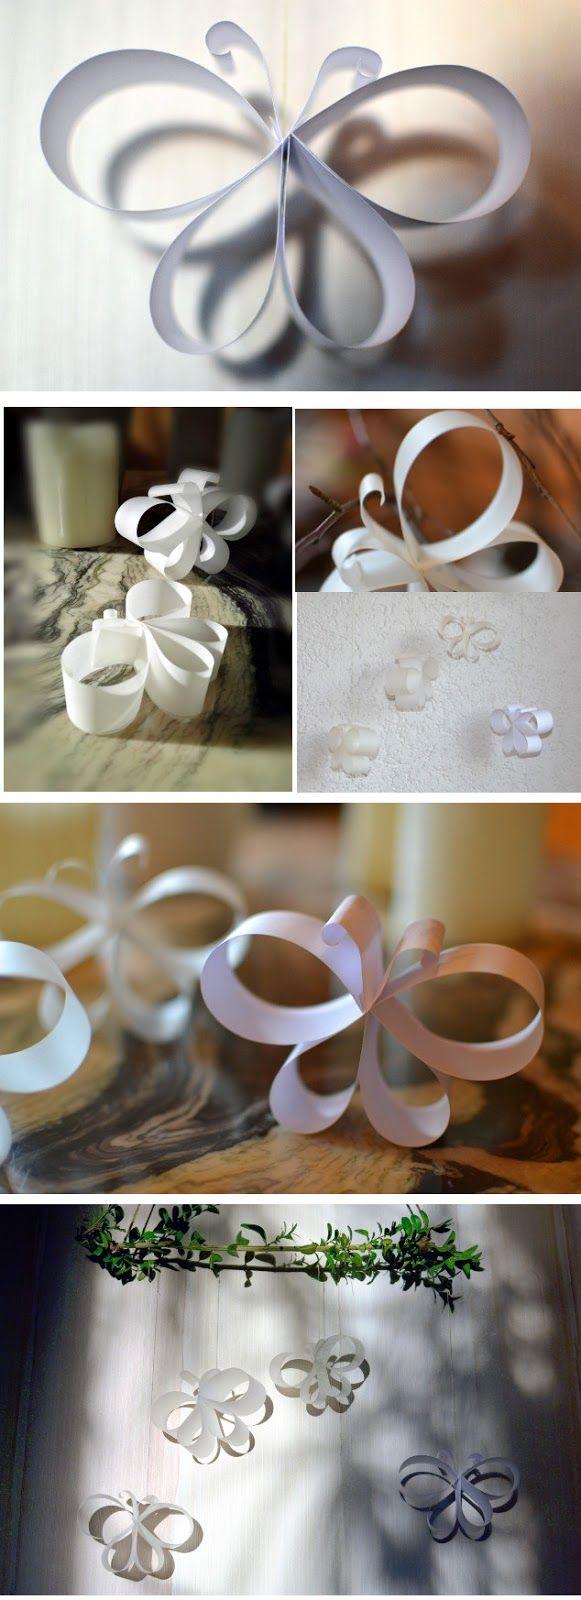 Hé, wie vliegt er? Eenvoudige vlinders gemaakt van papieren strips, goed geschikt …  – Frühjahr in Grün und Weiß